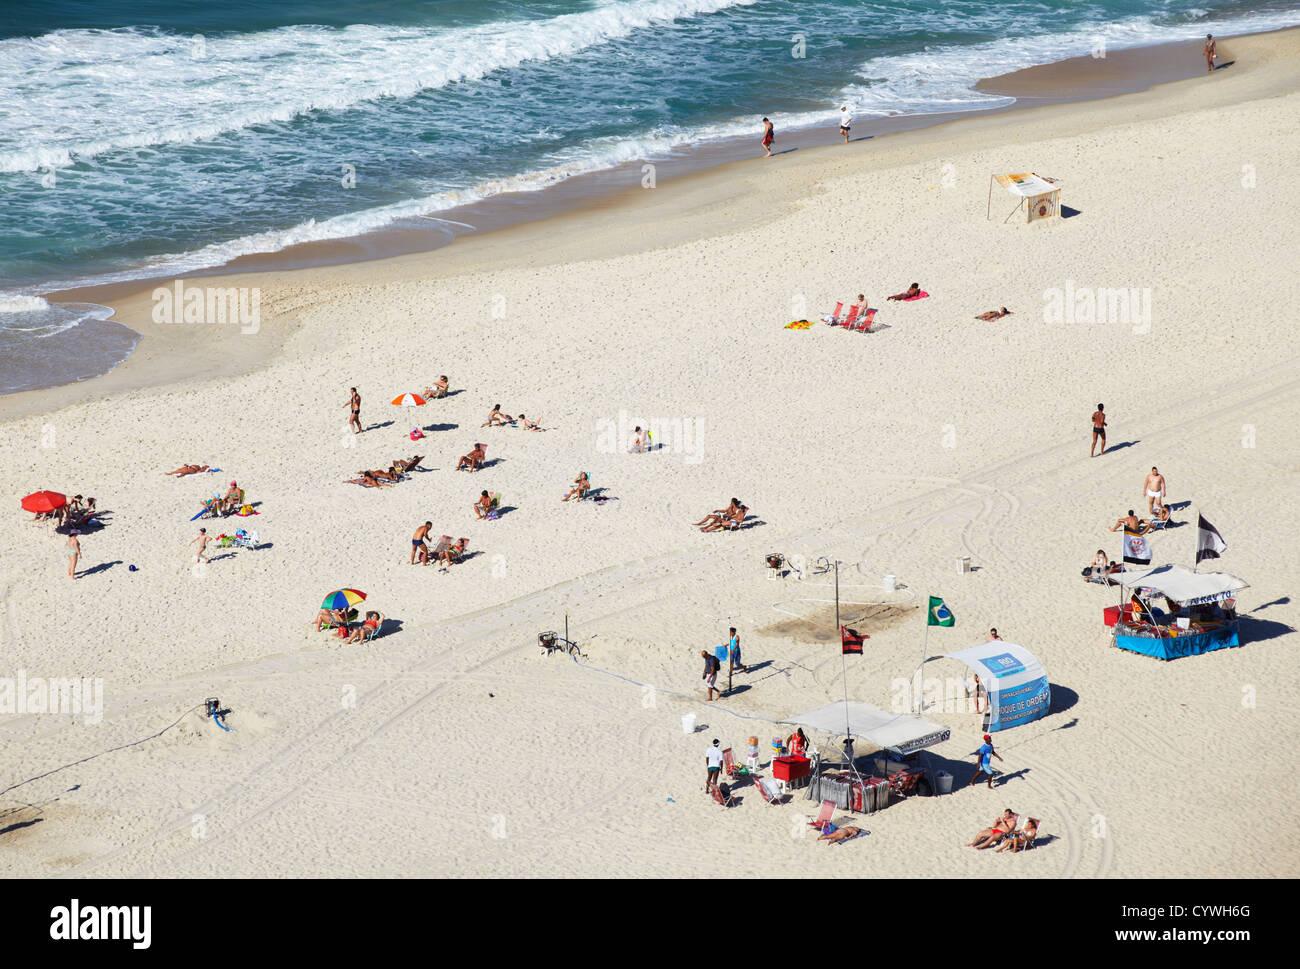 View of Copacabana beach, Copacabana, Rio de Janeiro, Brazil - Stock Image